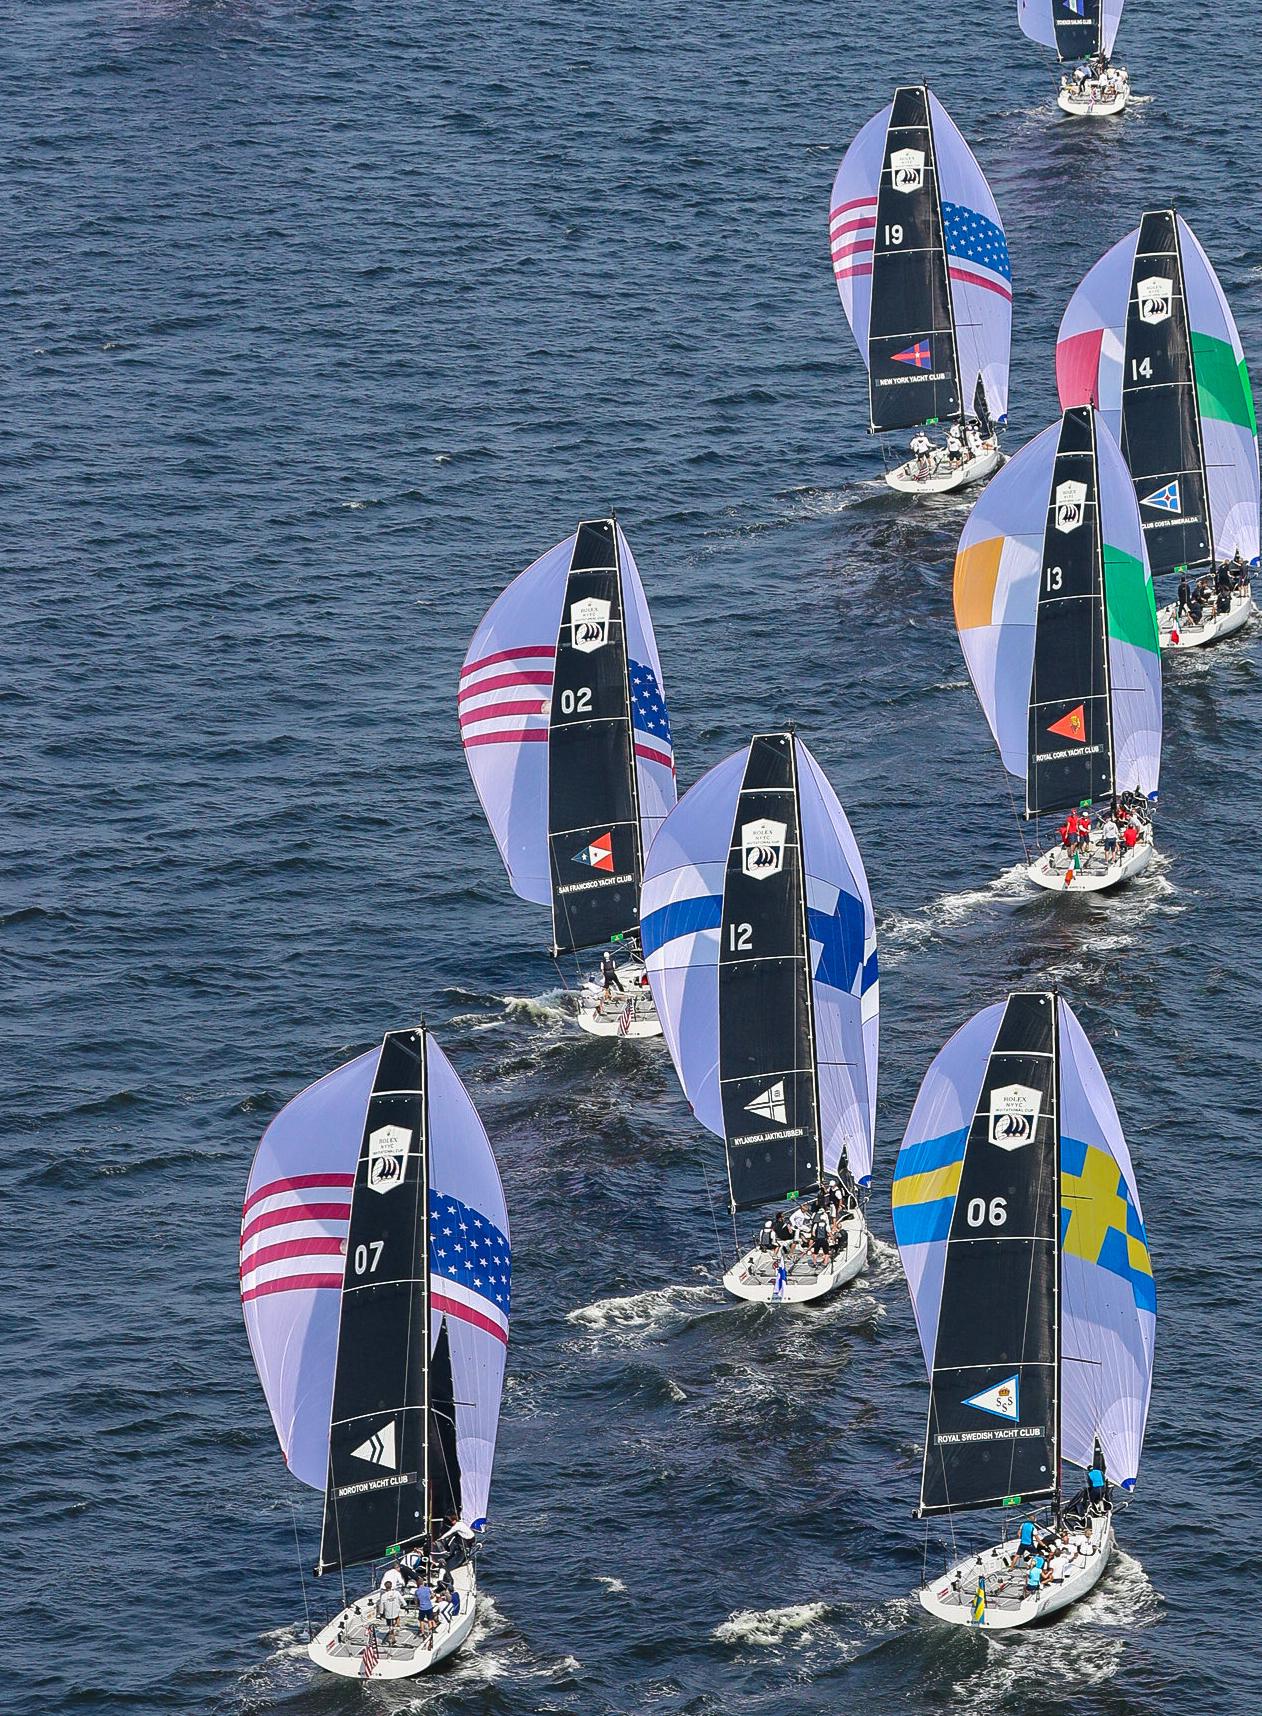 Aerial shot of fleet on kite run.